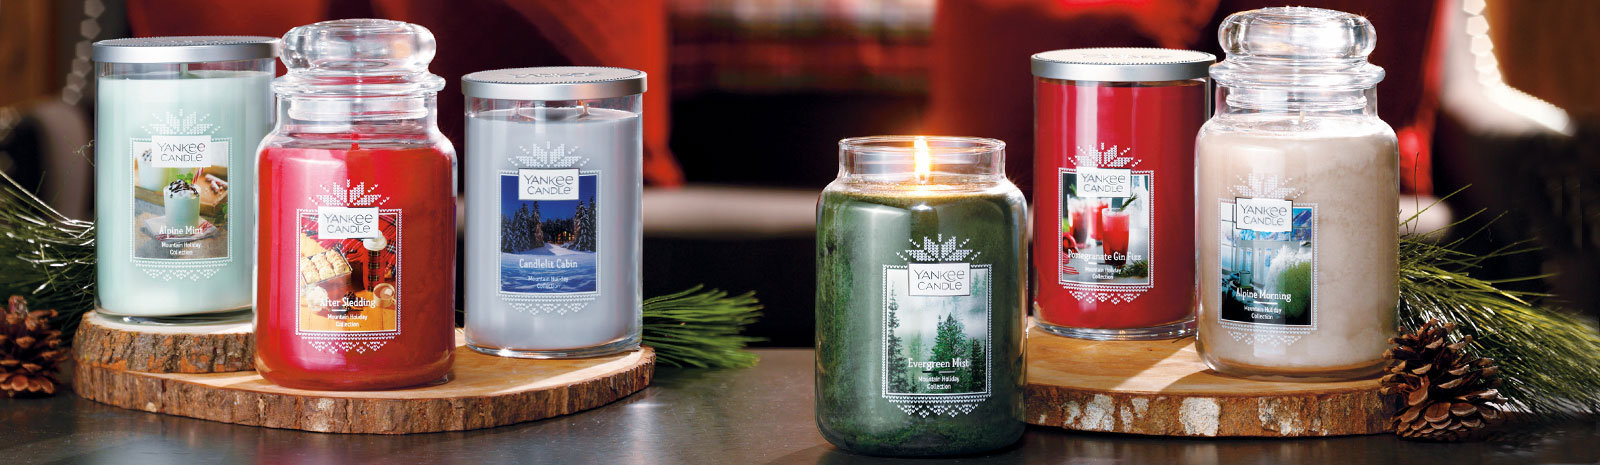 Tumbler Candles - Yankee Candle®